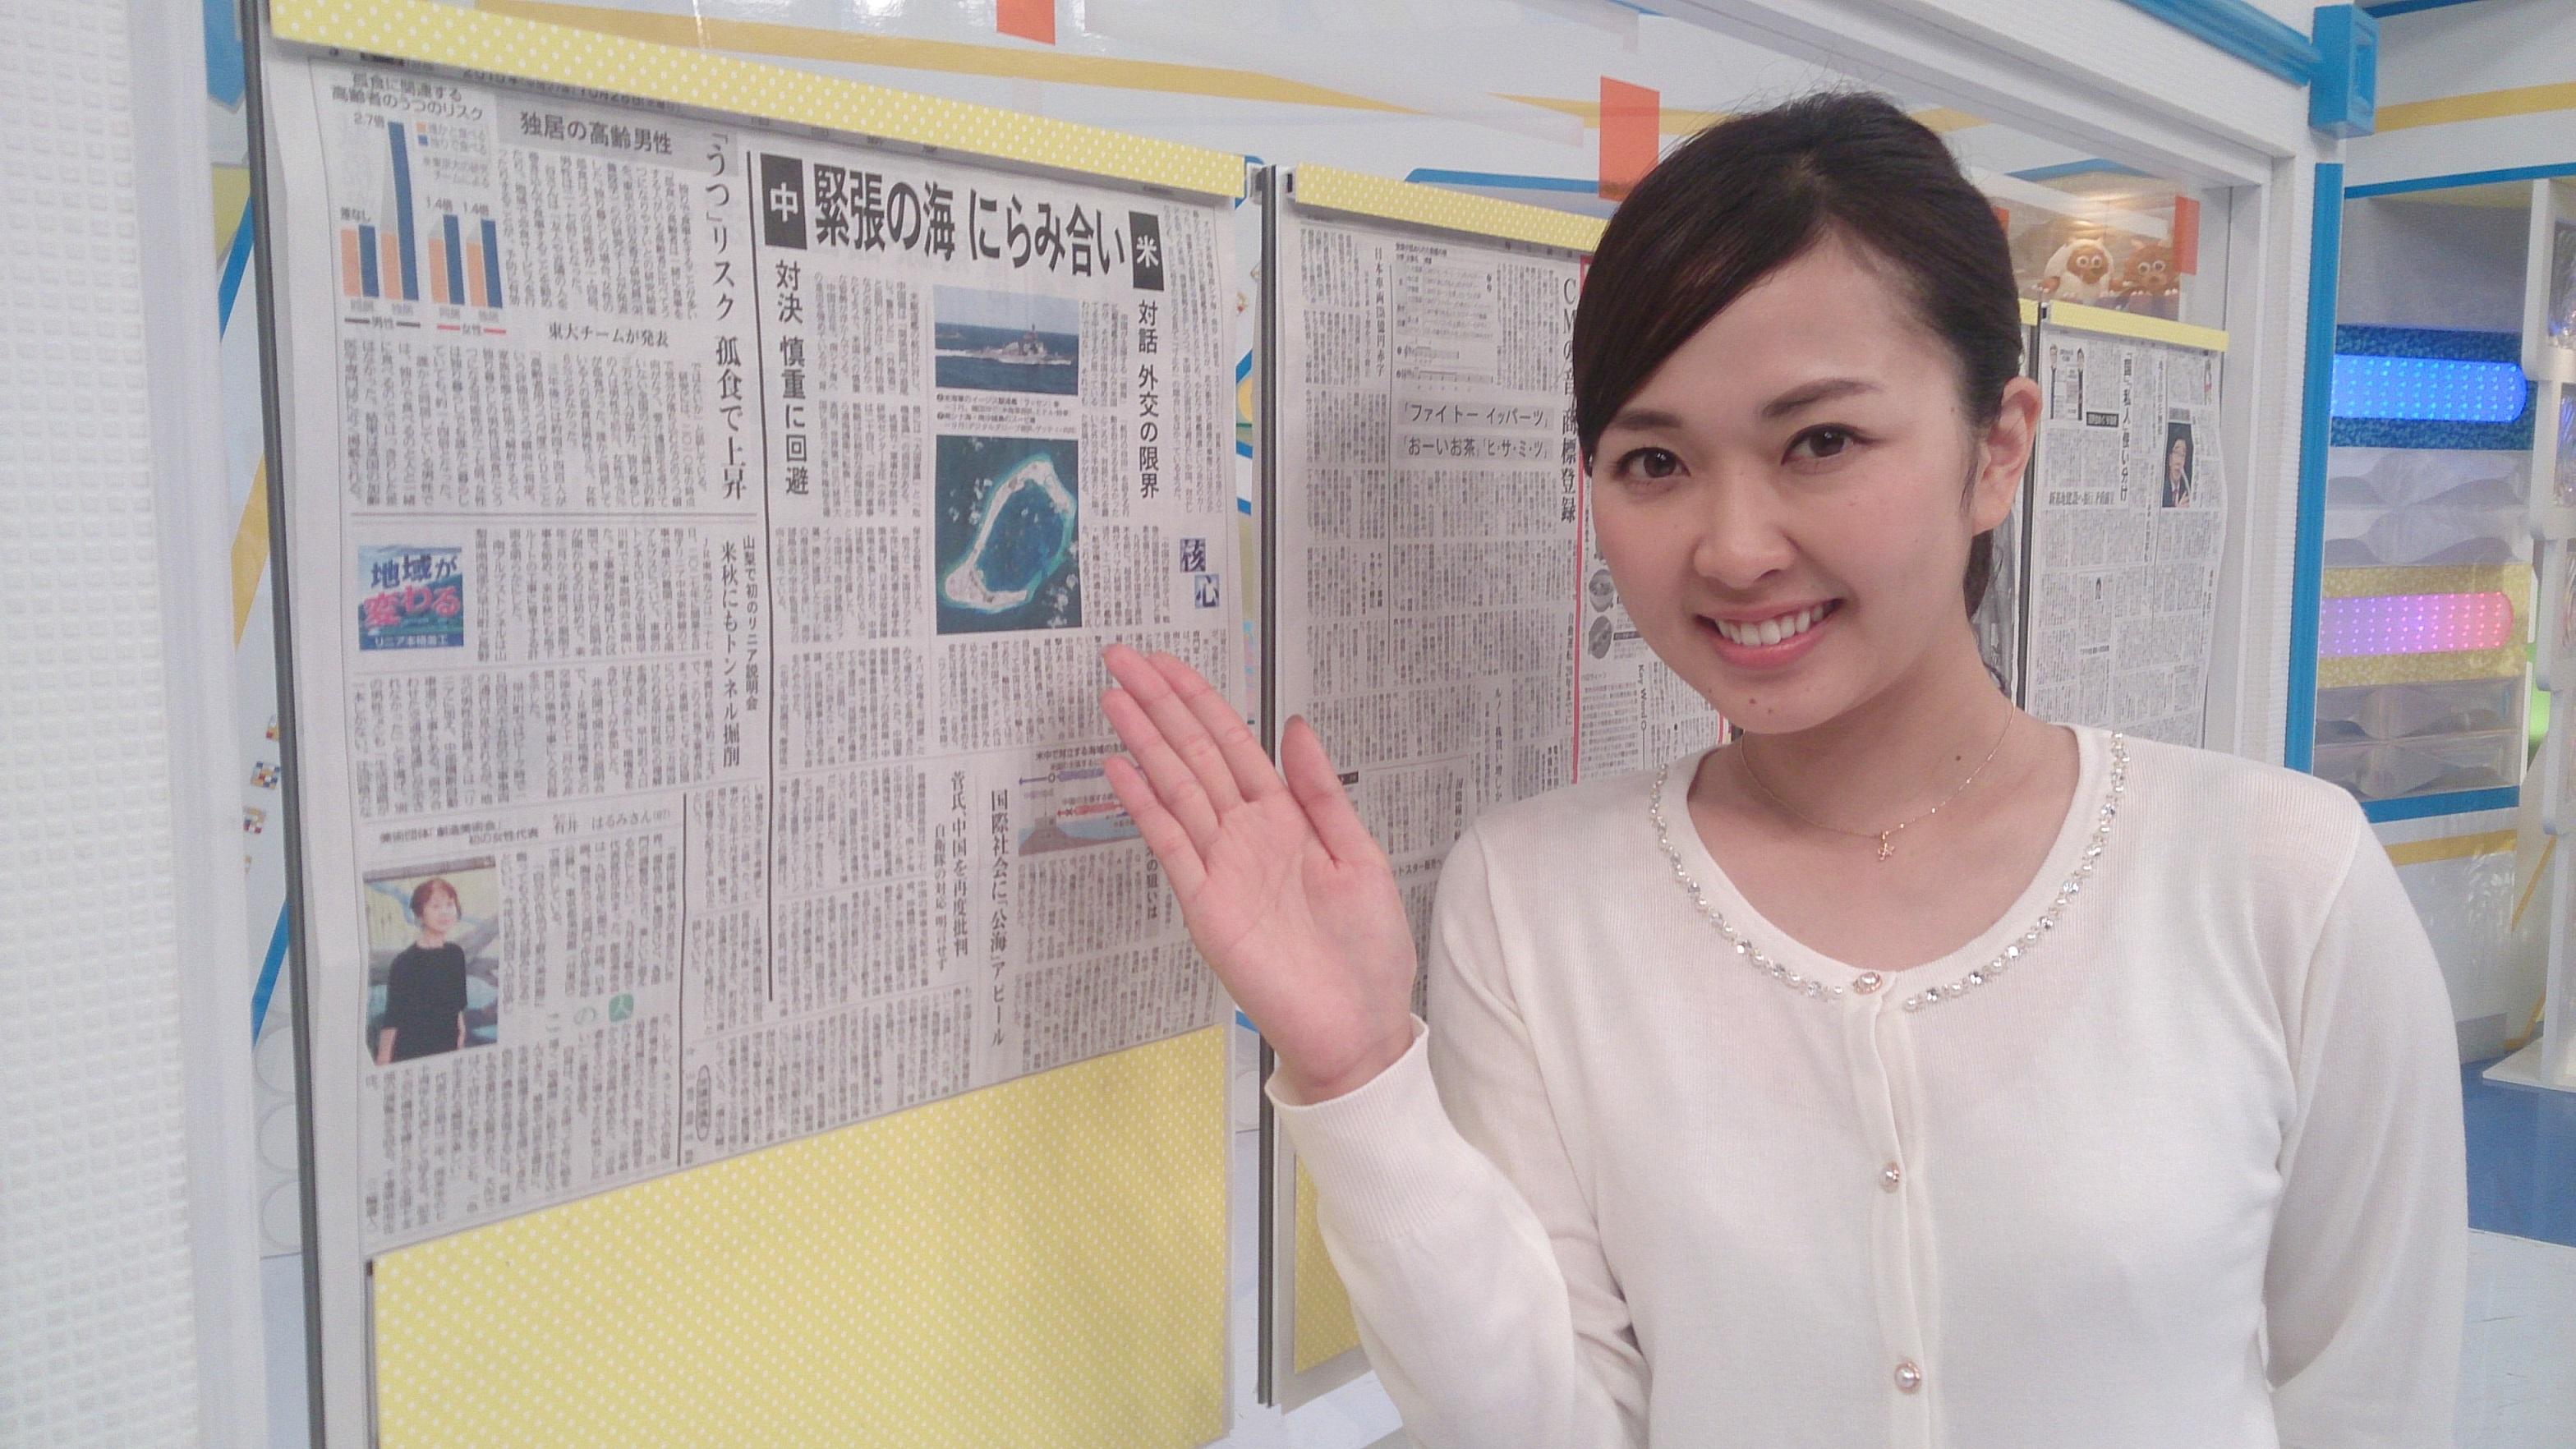 徳重杏奈の画像 p1_31